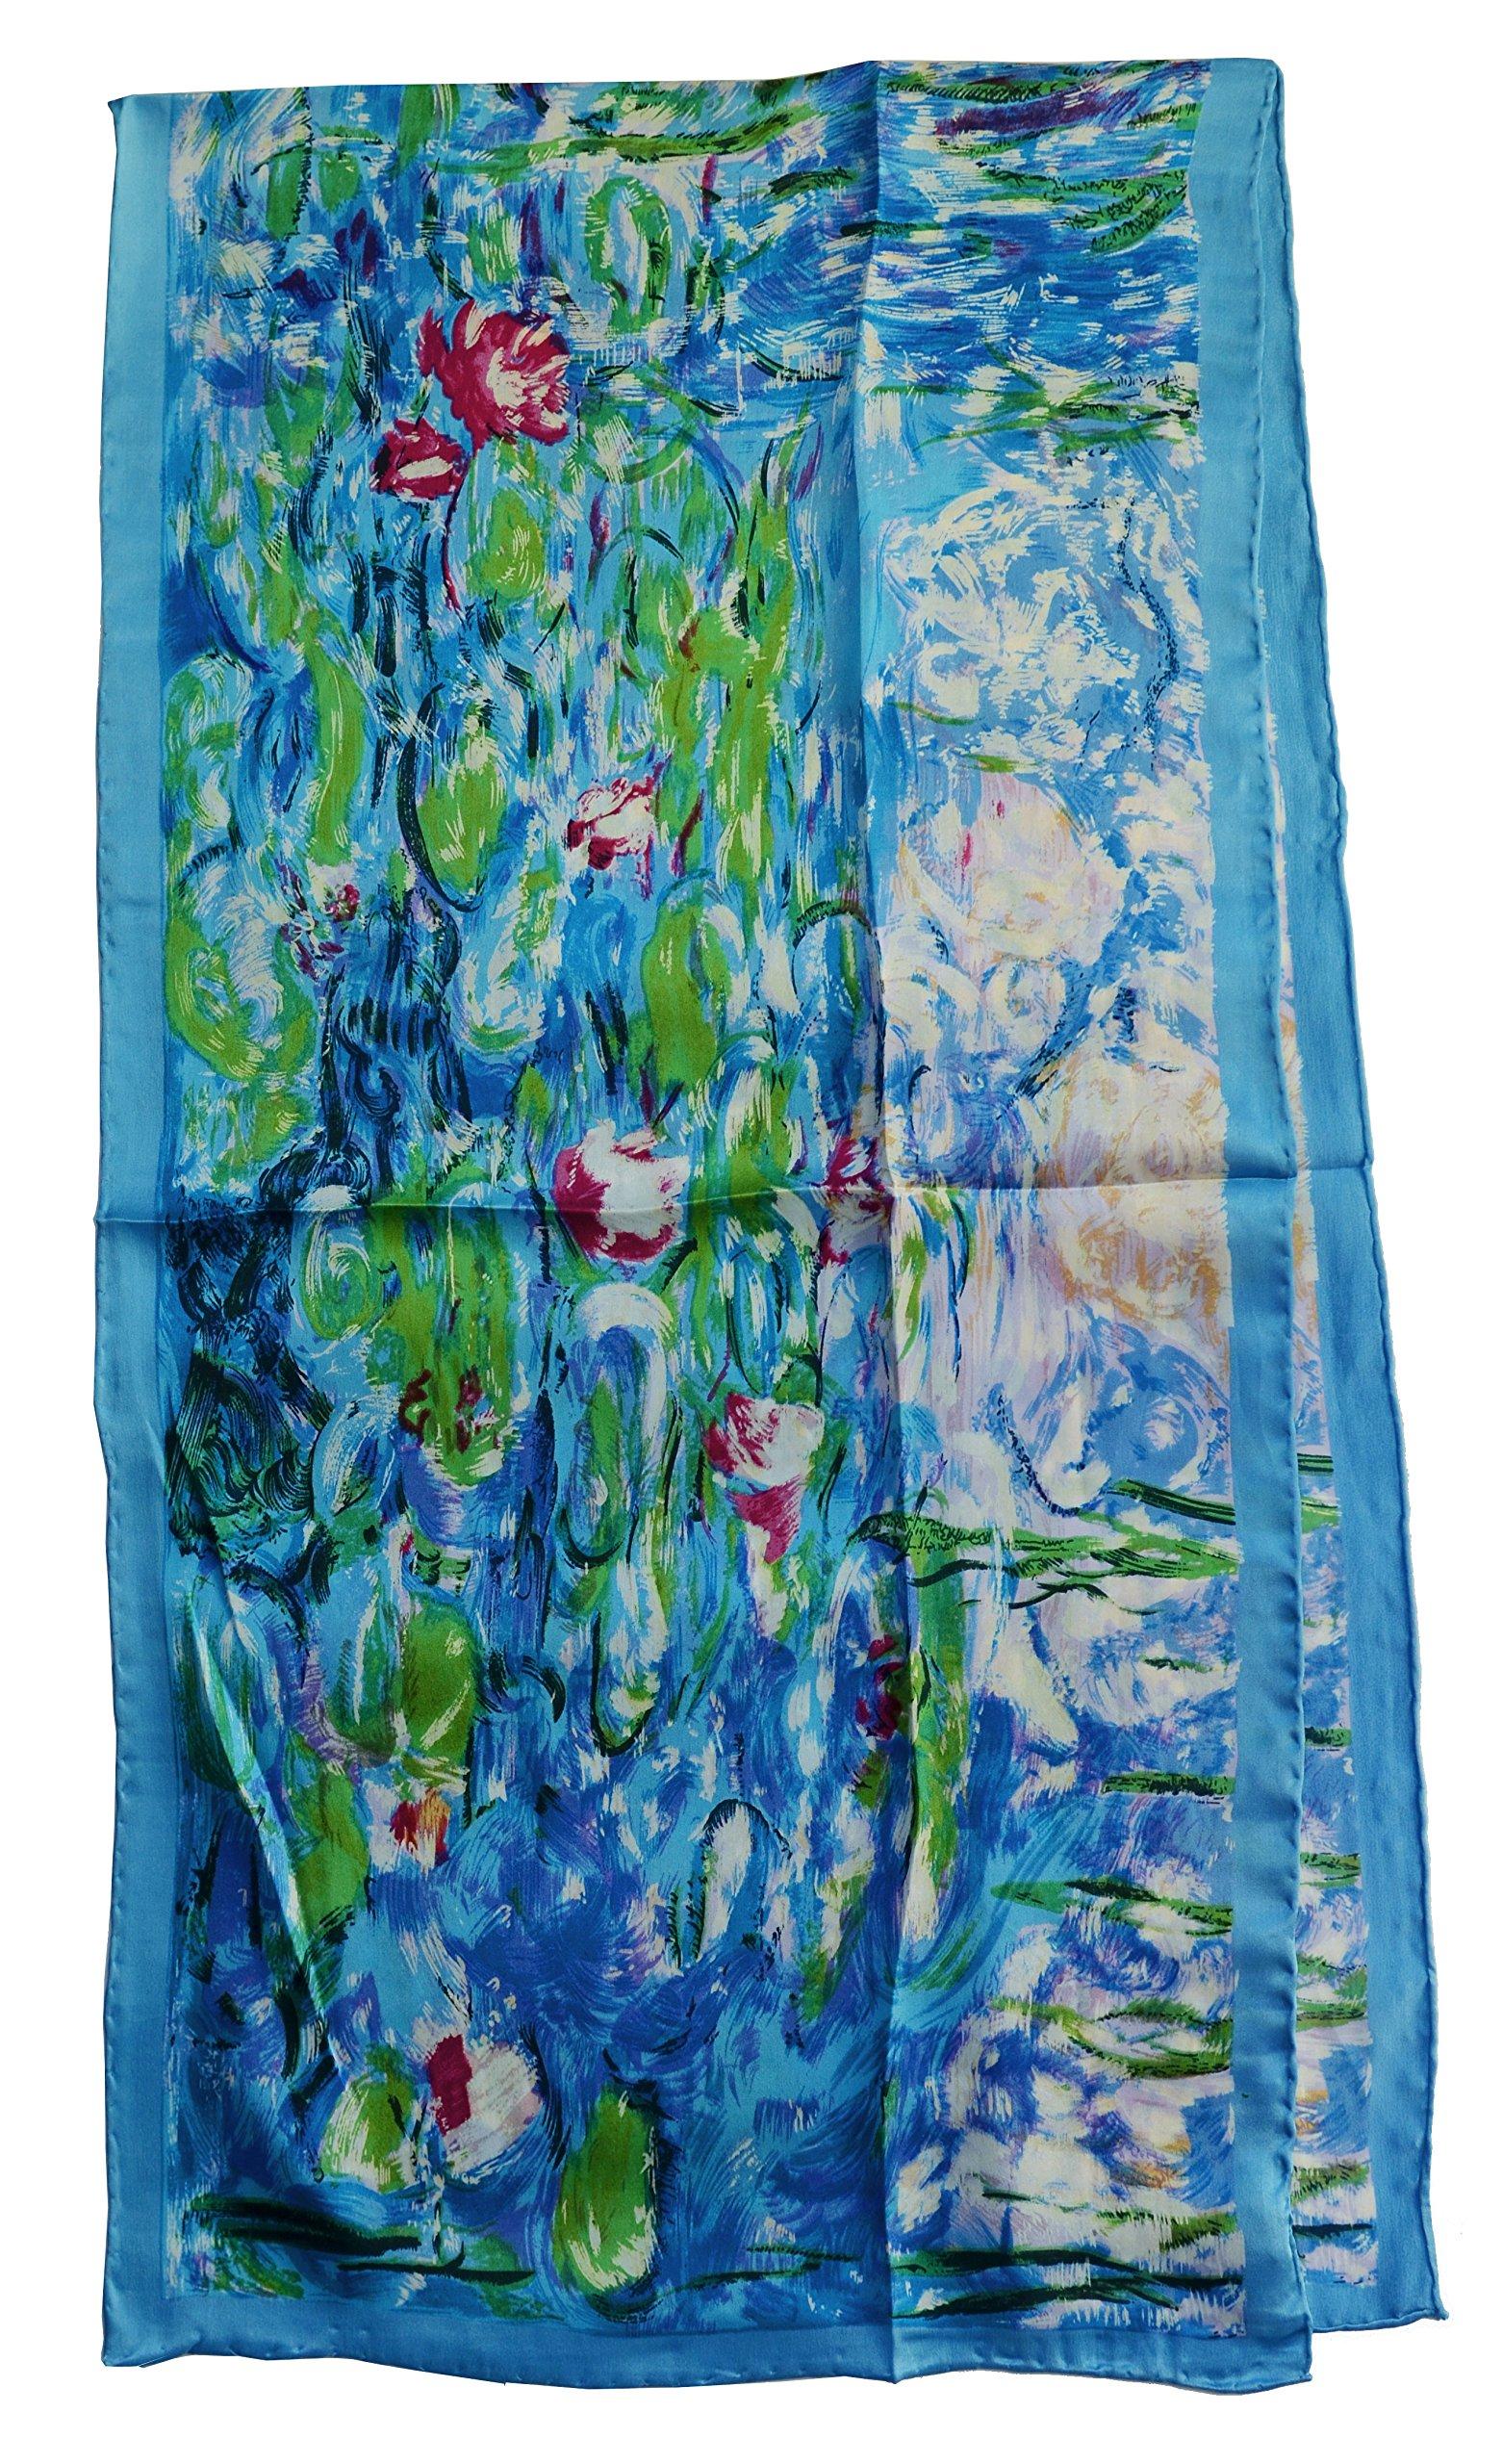 Van Gogh and Claude Monets Paintings, Fashion Silk Scarf Premium Shawl Wrap Art (Claude Monet's Water Lilies)